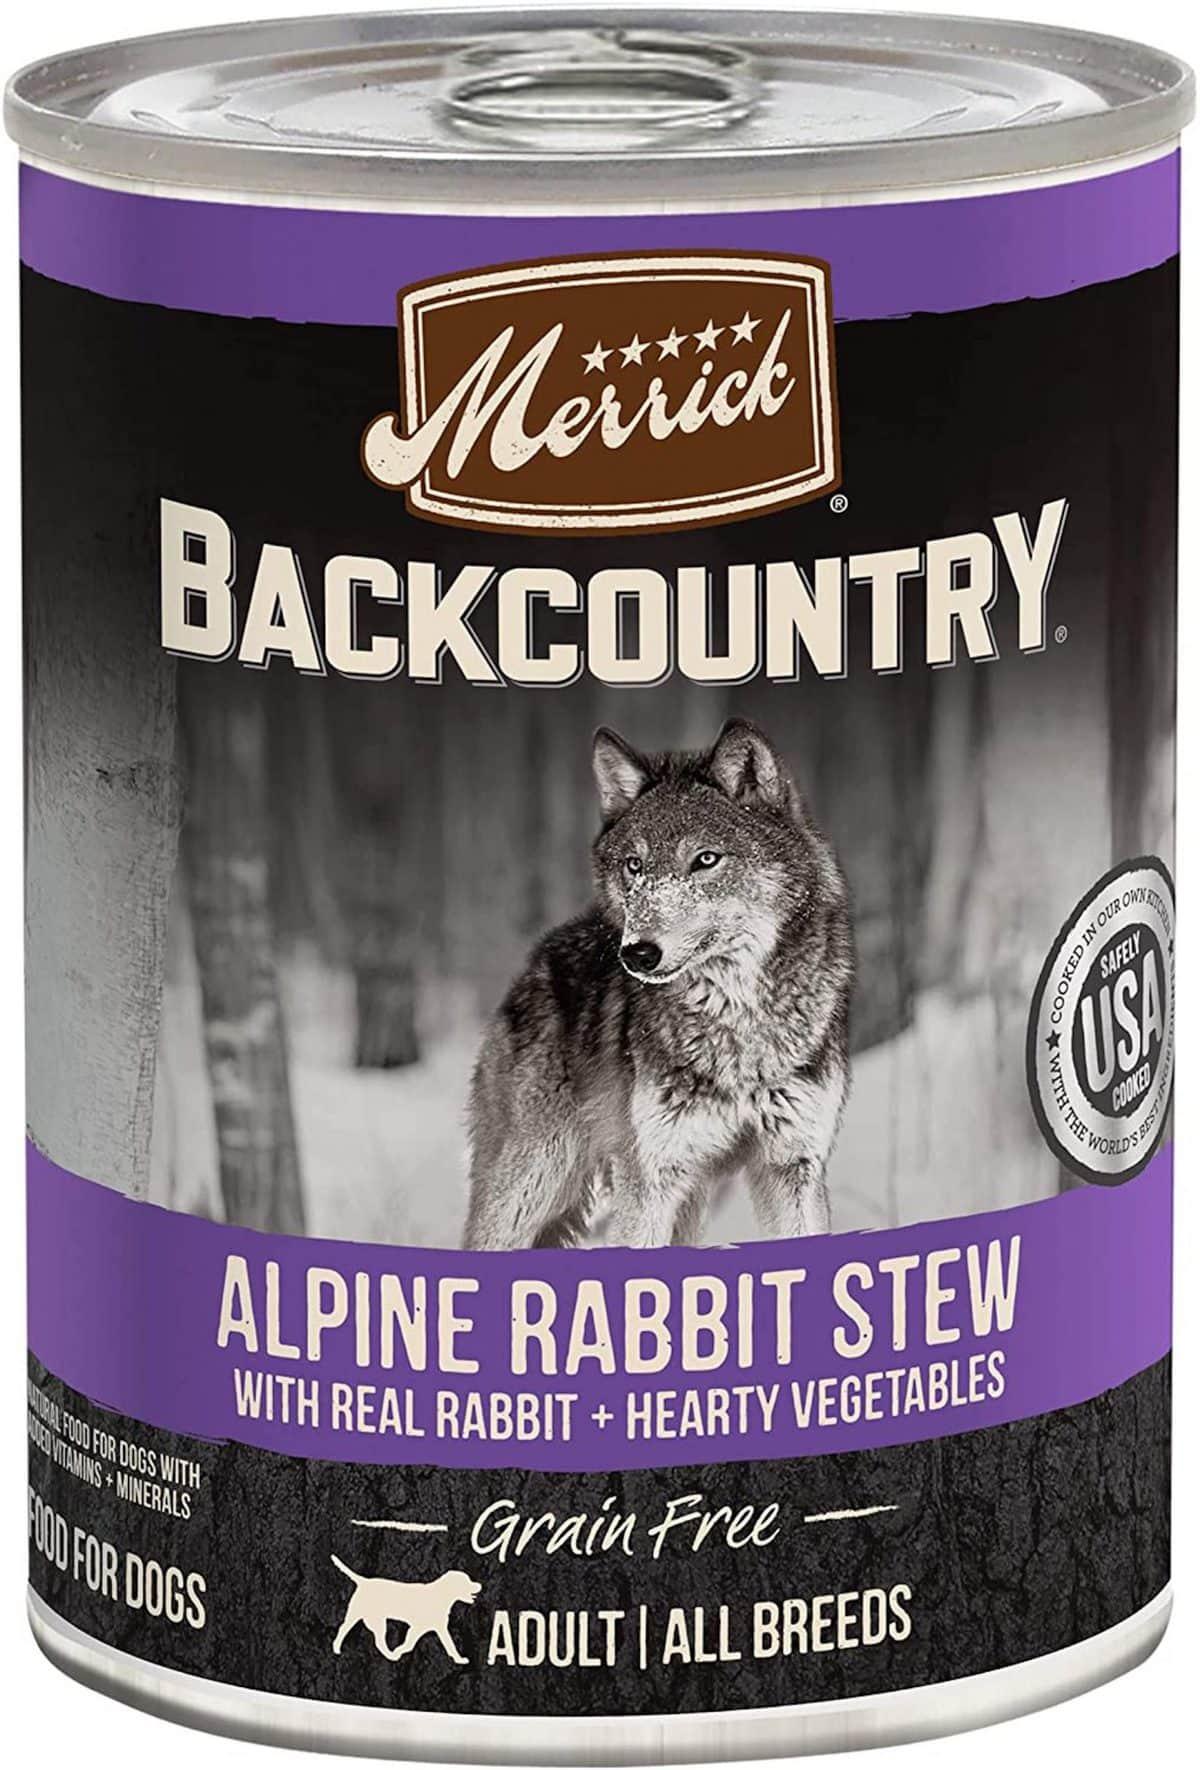 Merrick Backcountry Rabbit Stew